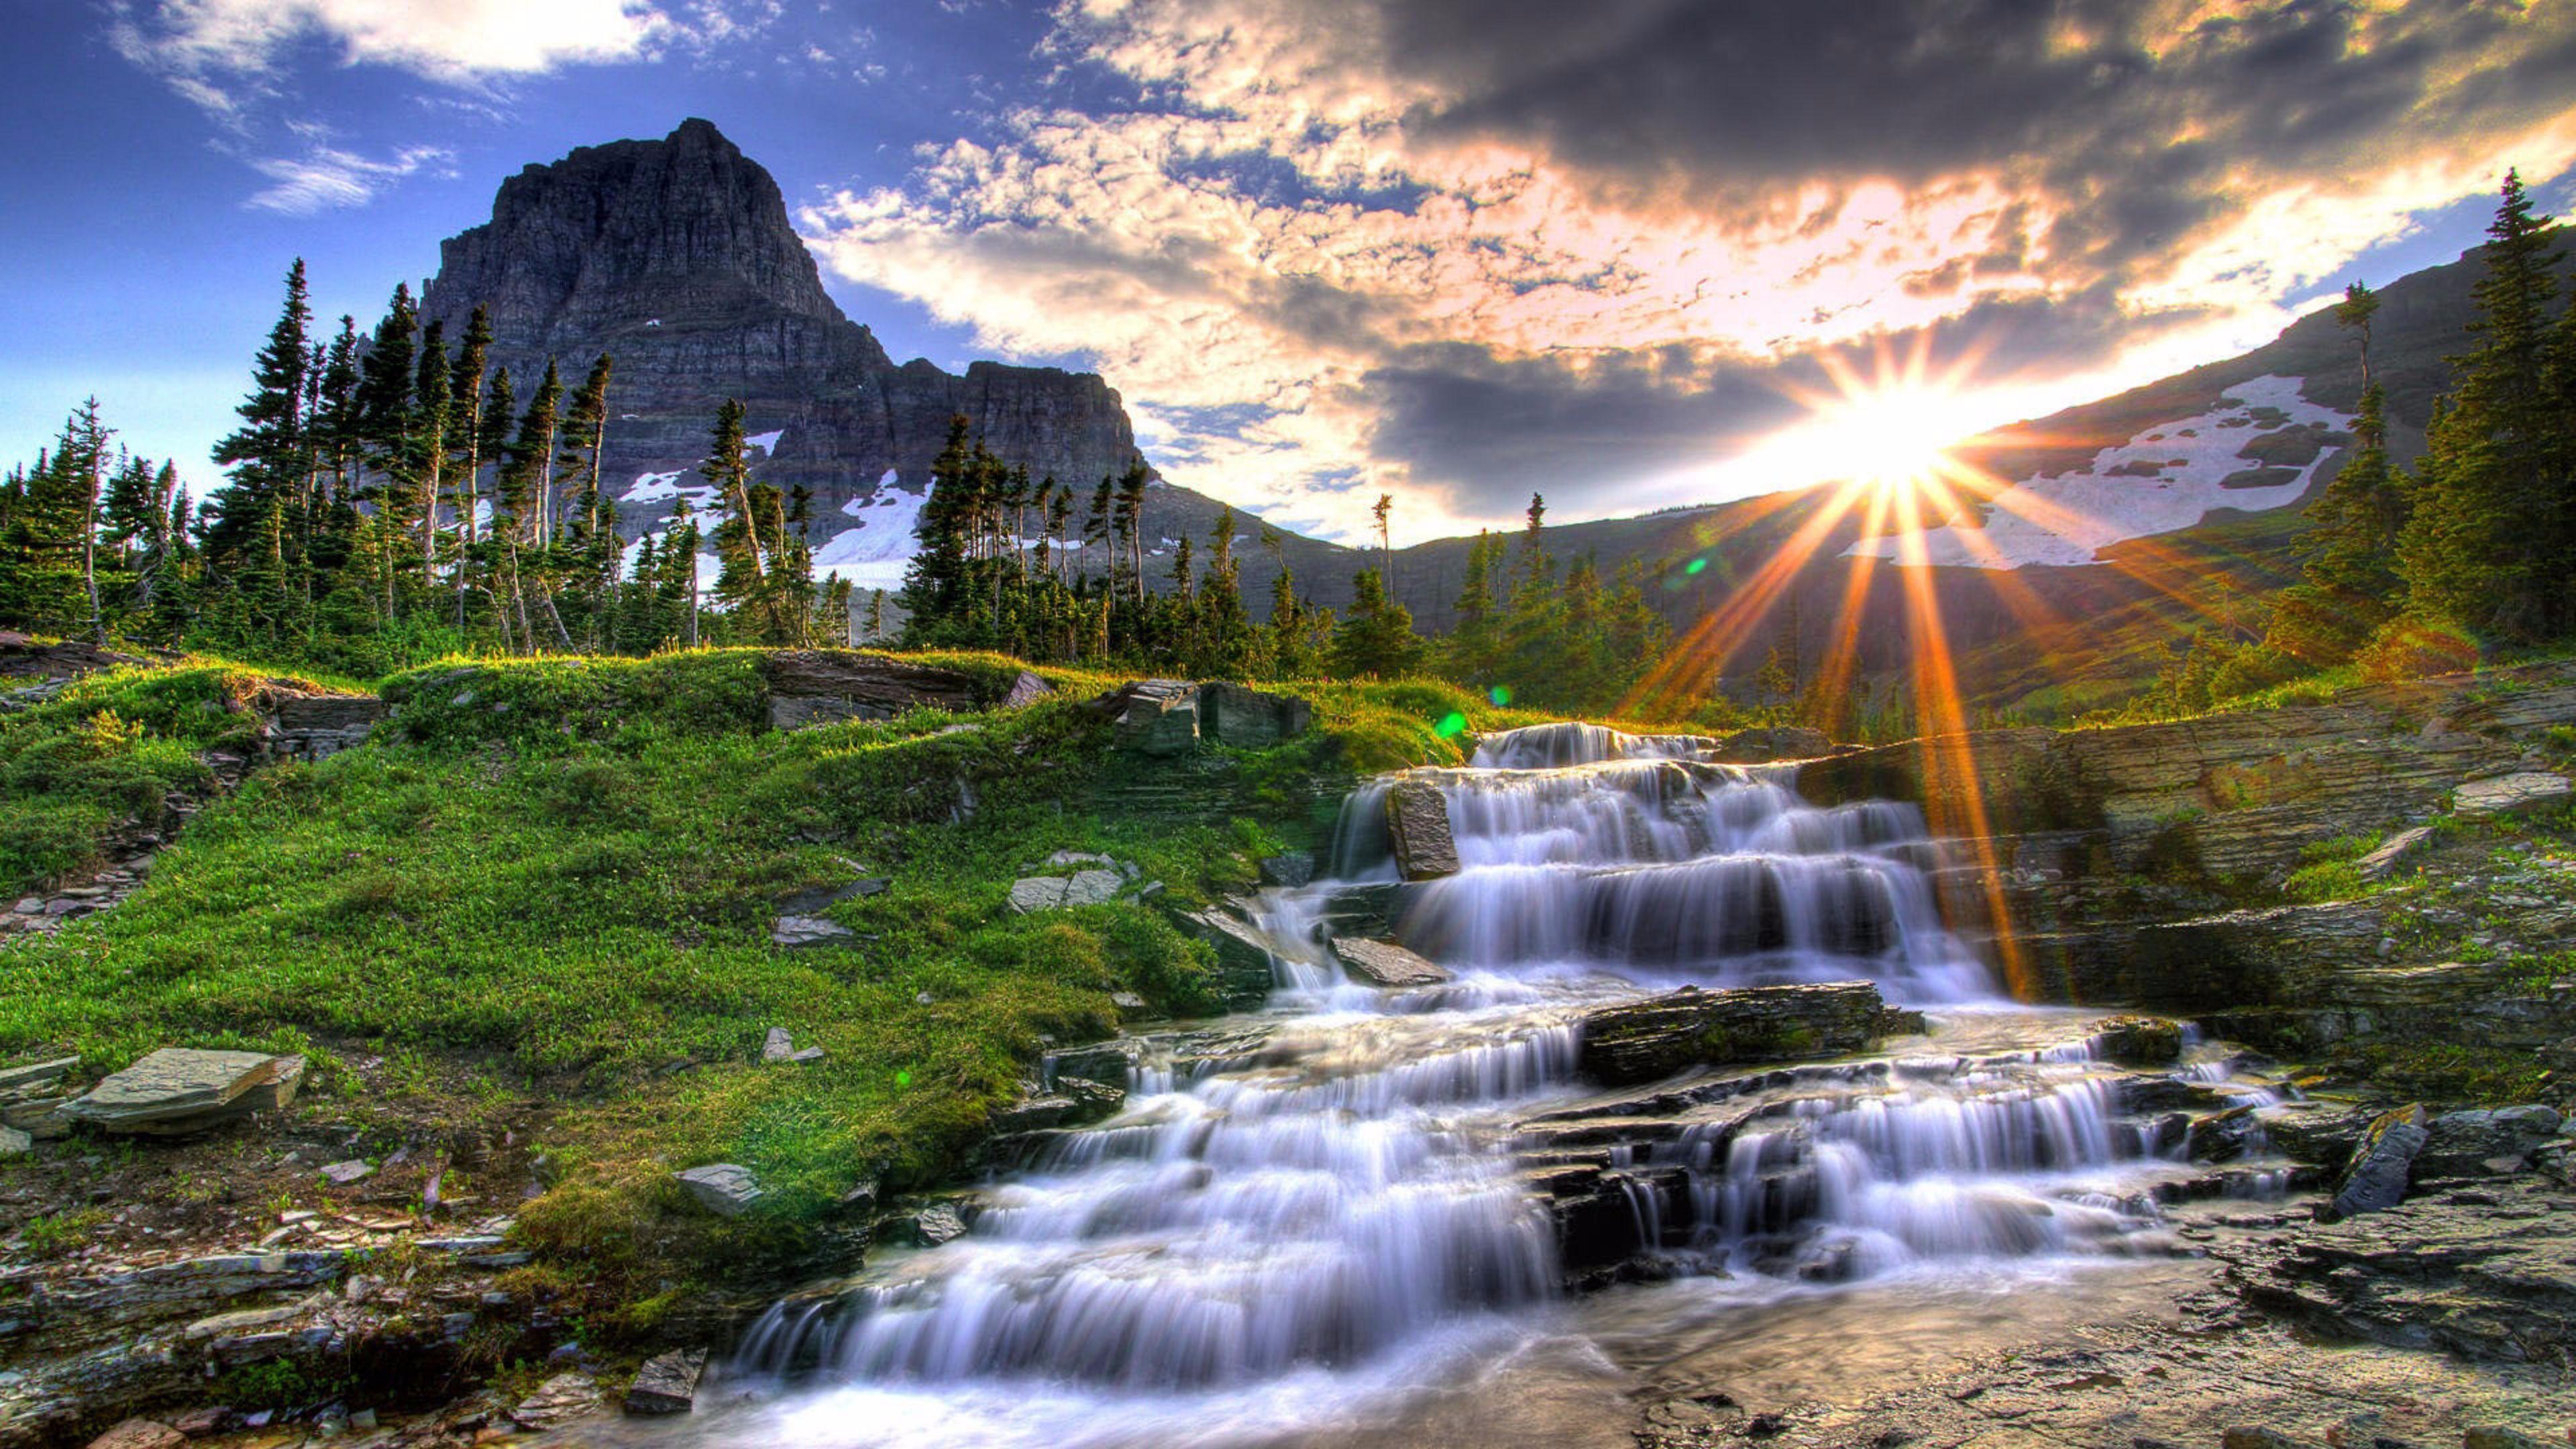 Sunrise Uhd 4k Mountains Wallpaper - Nature 1080p - HD Wallpaper